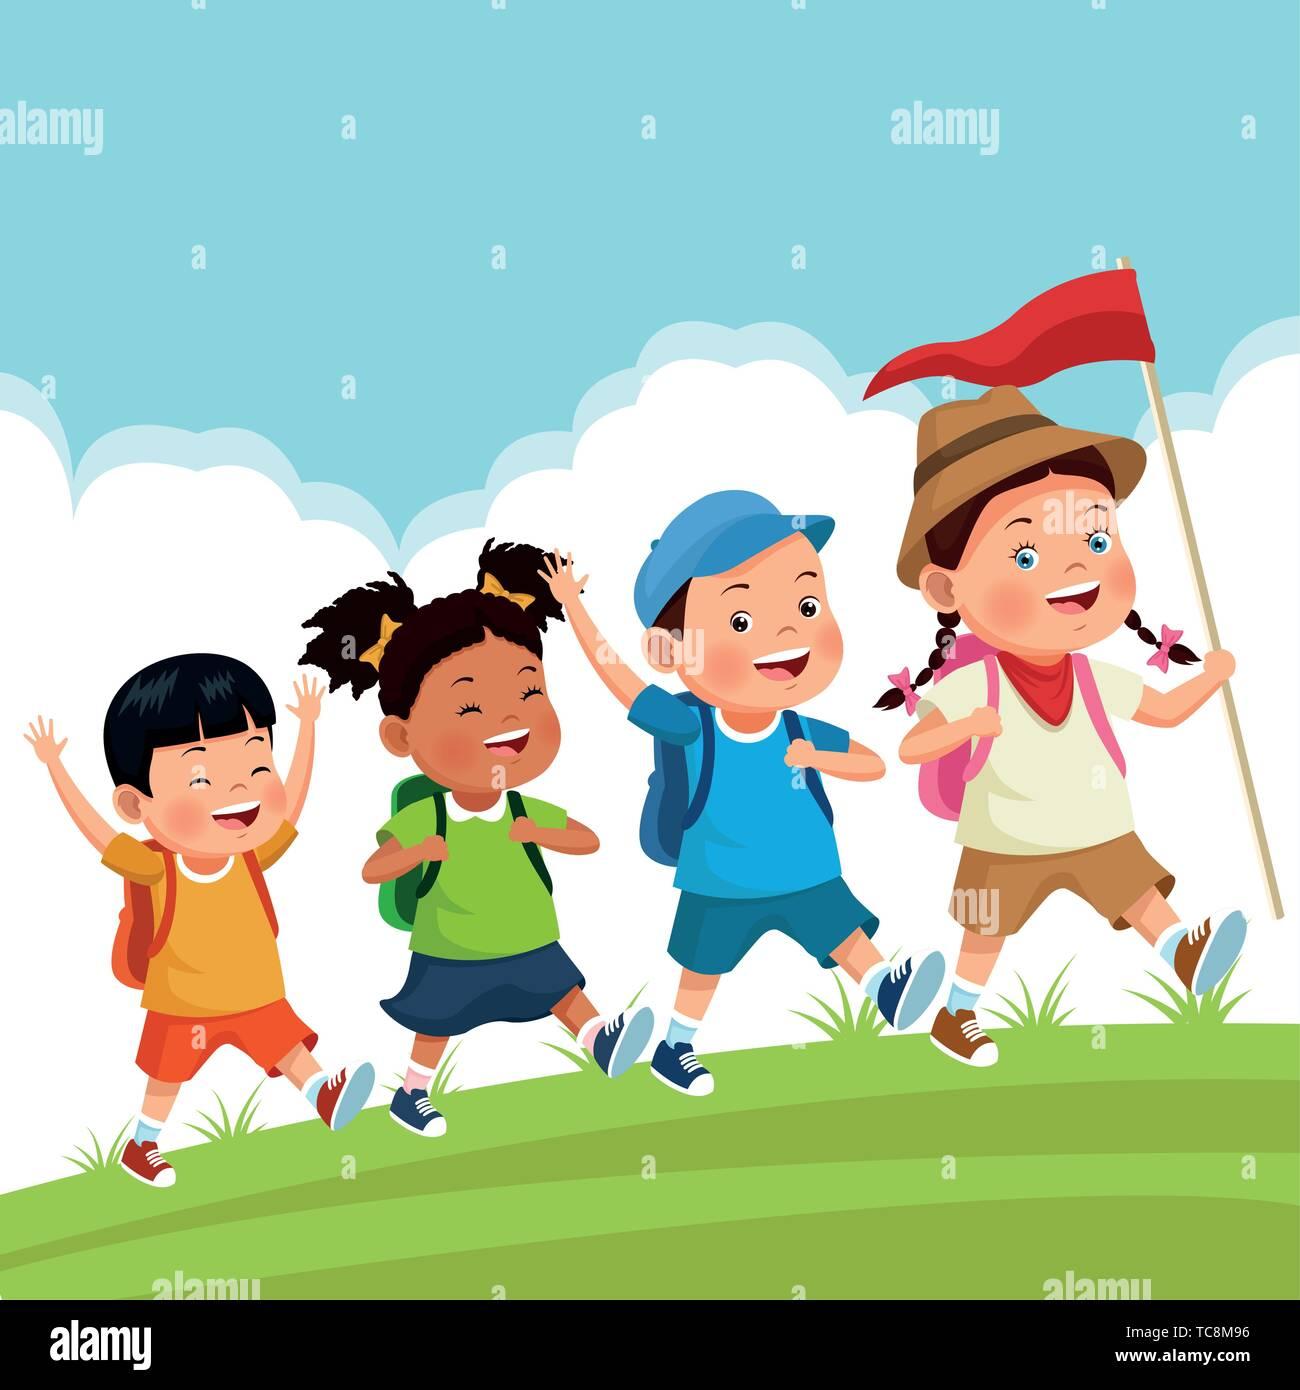 Kinder auf Schulausflug Stock-Vektorgrafik - Alamy